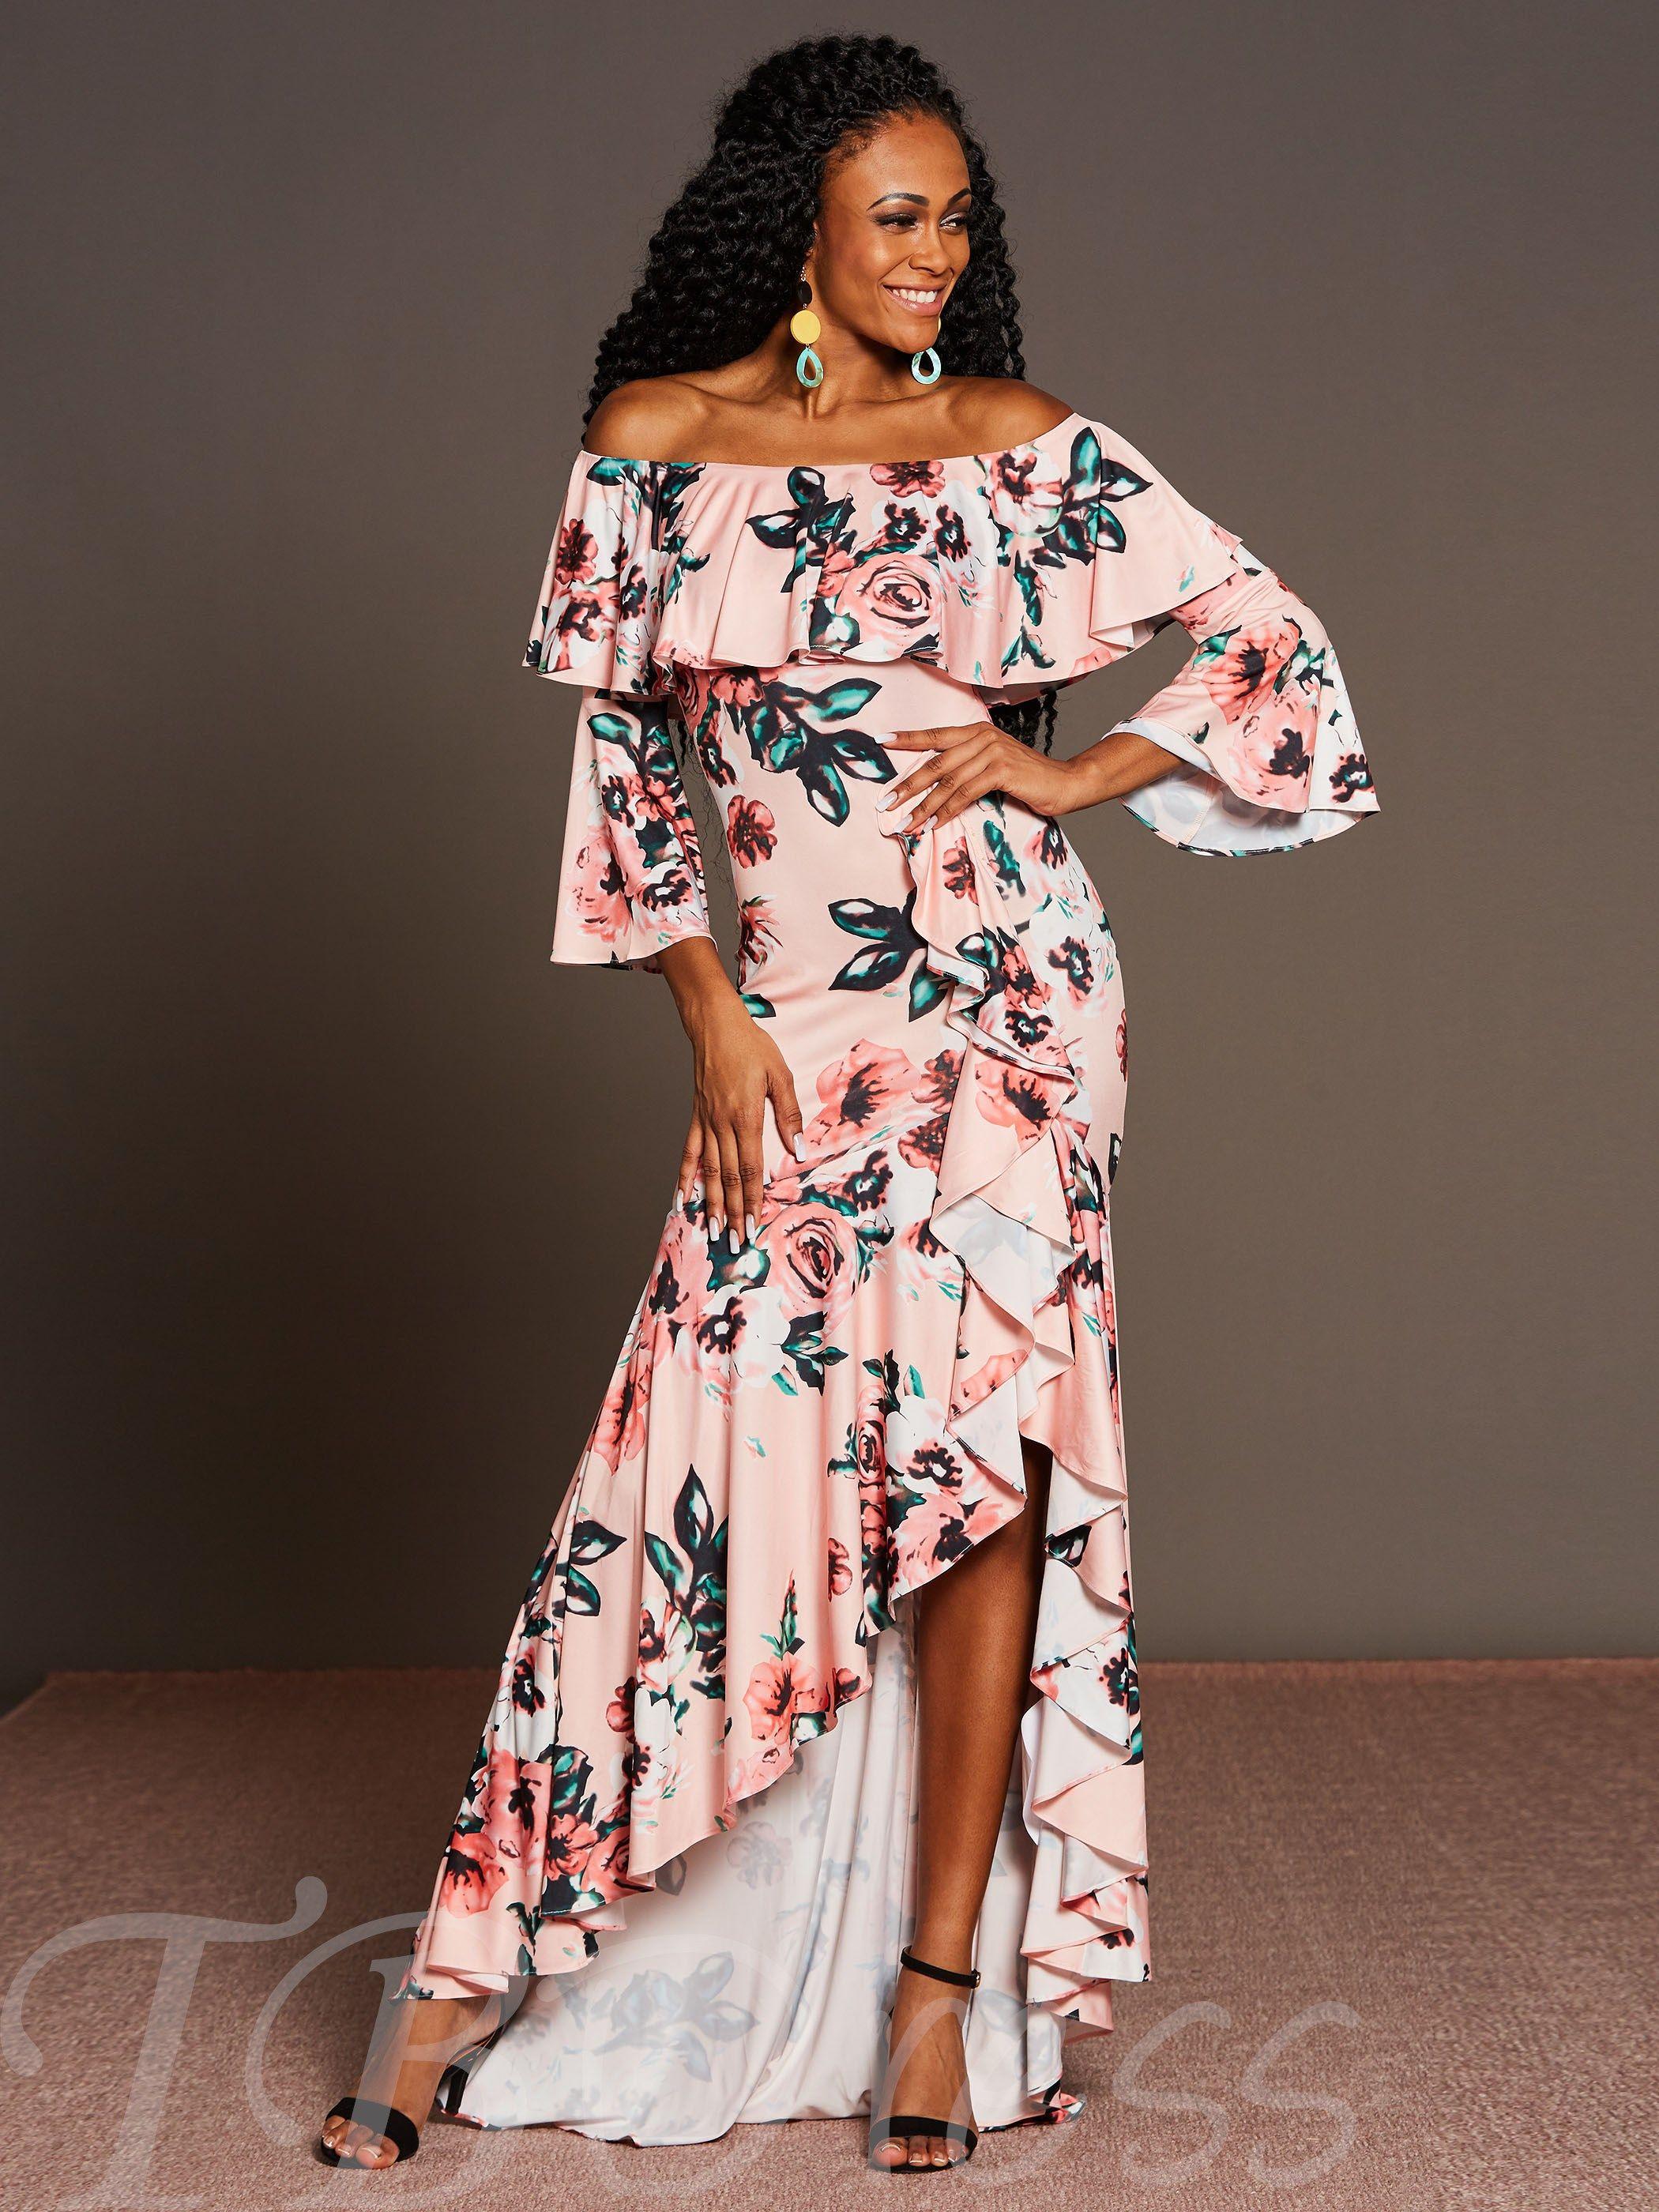 Pink 3 4 Sleeve Printing Women S Maxi Dress Cheap Maxi Dresses Womens Maxi Dresses Womens Floral Dress [ 2800 x 2100 Pixel ]